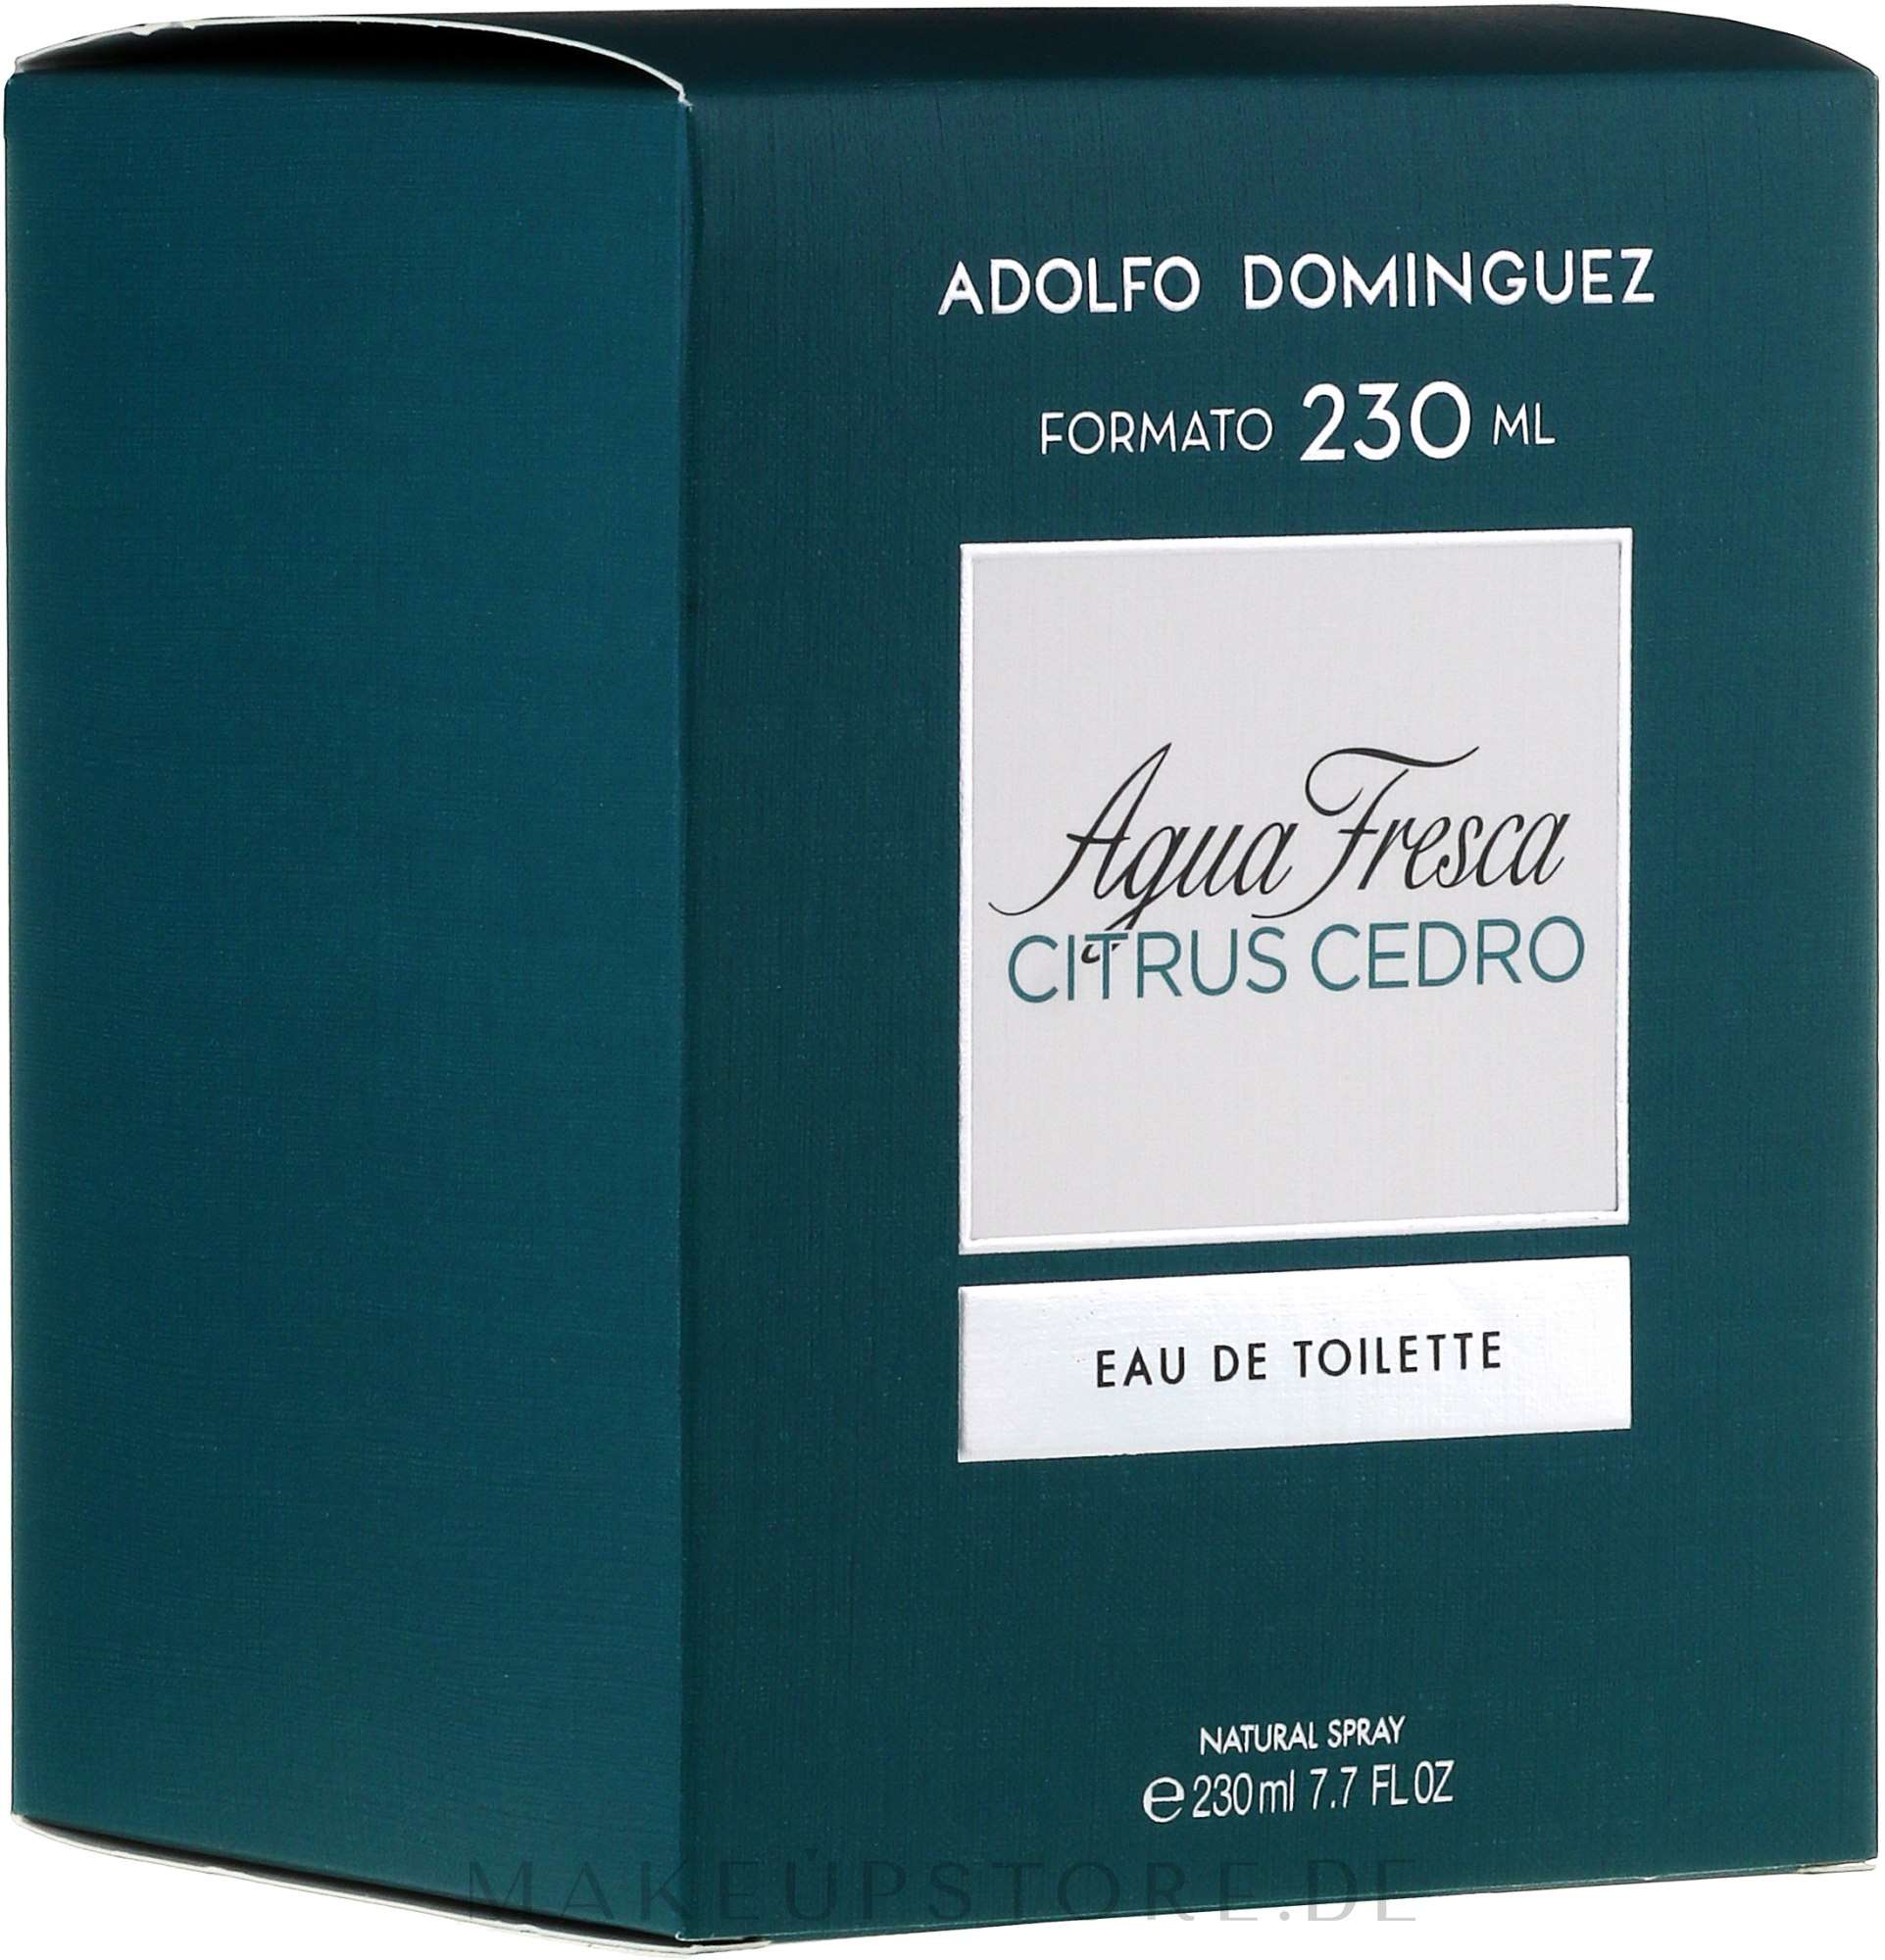 Adolfo Dominguez Agua Fresca Citrus Cedro - Eau de Toilette — Bild 60 ml